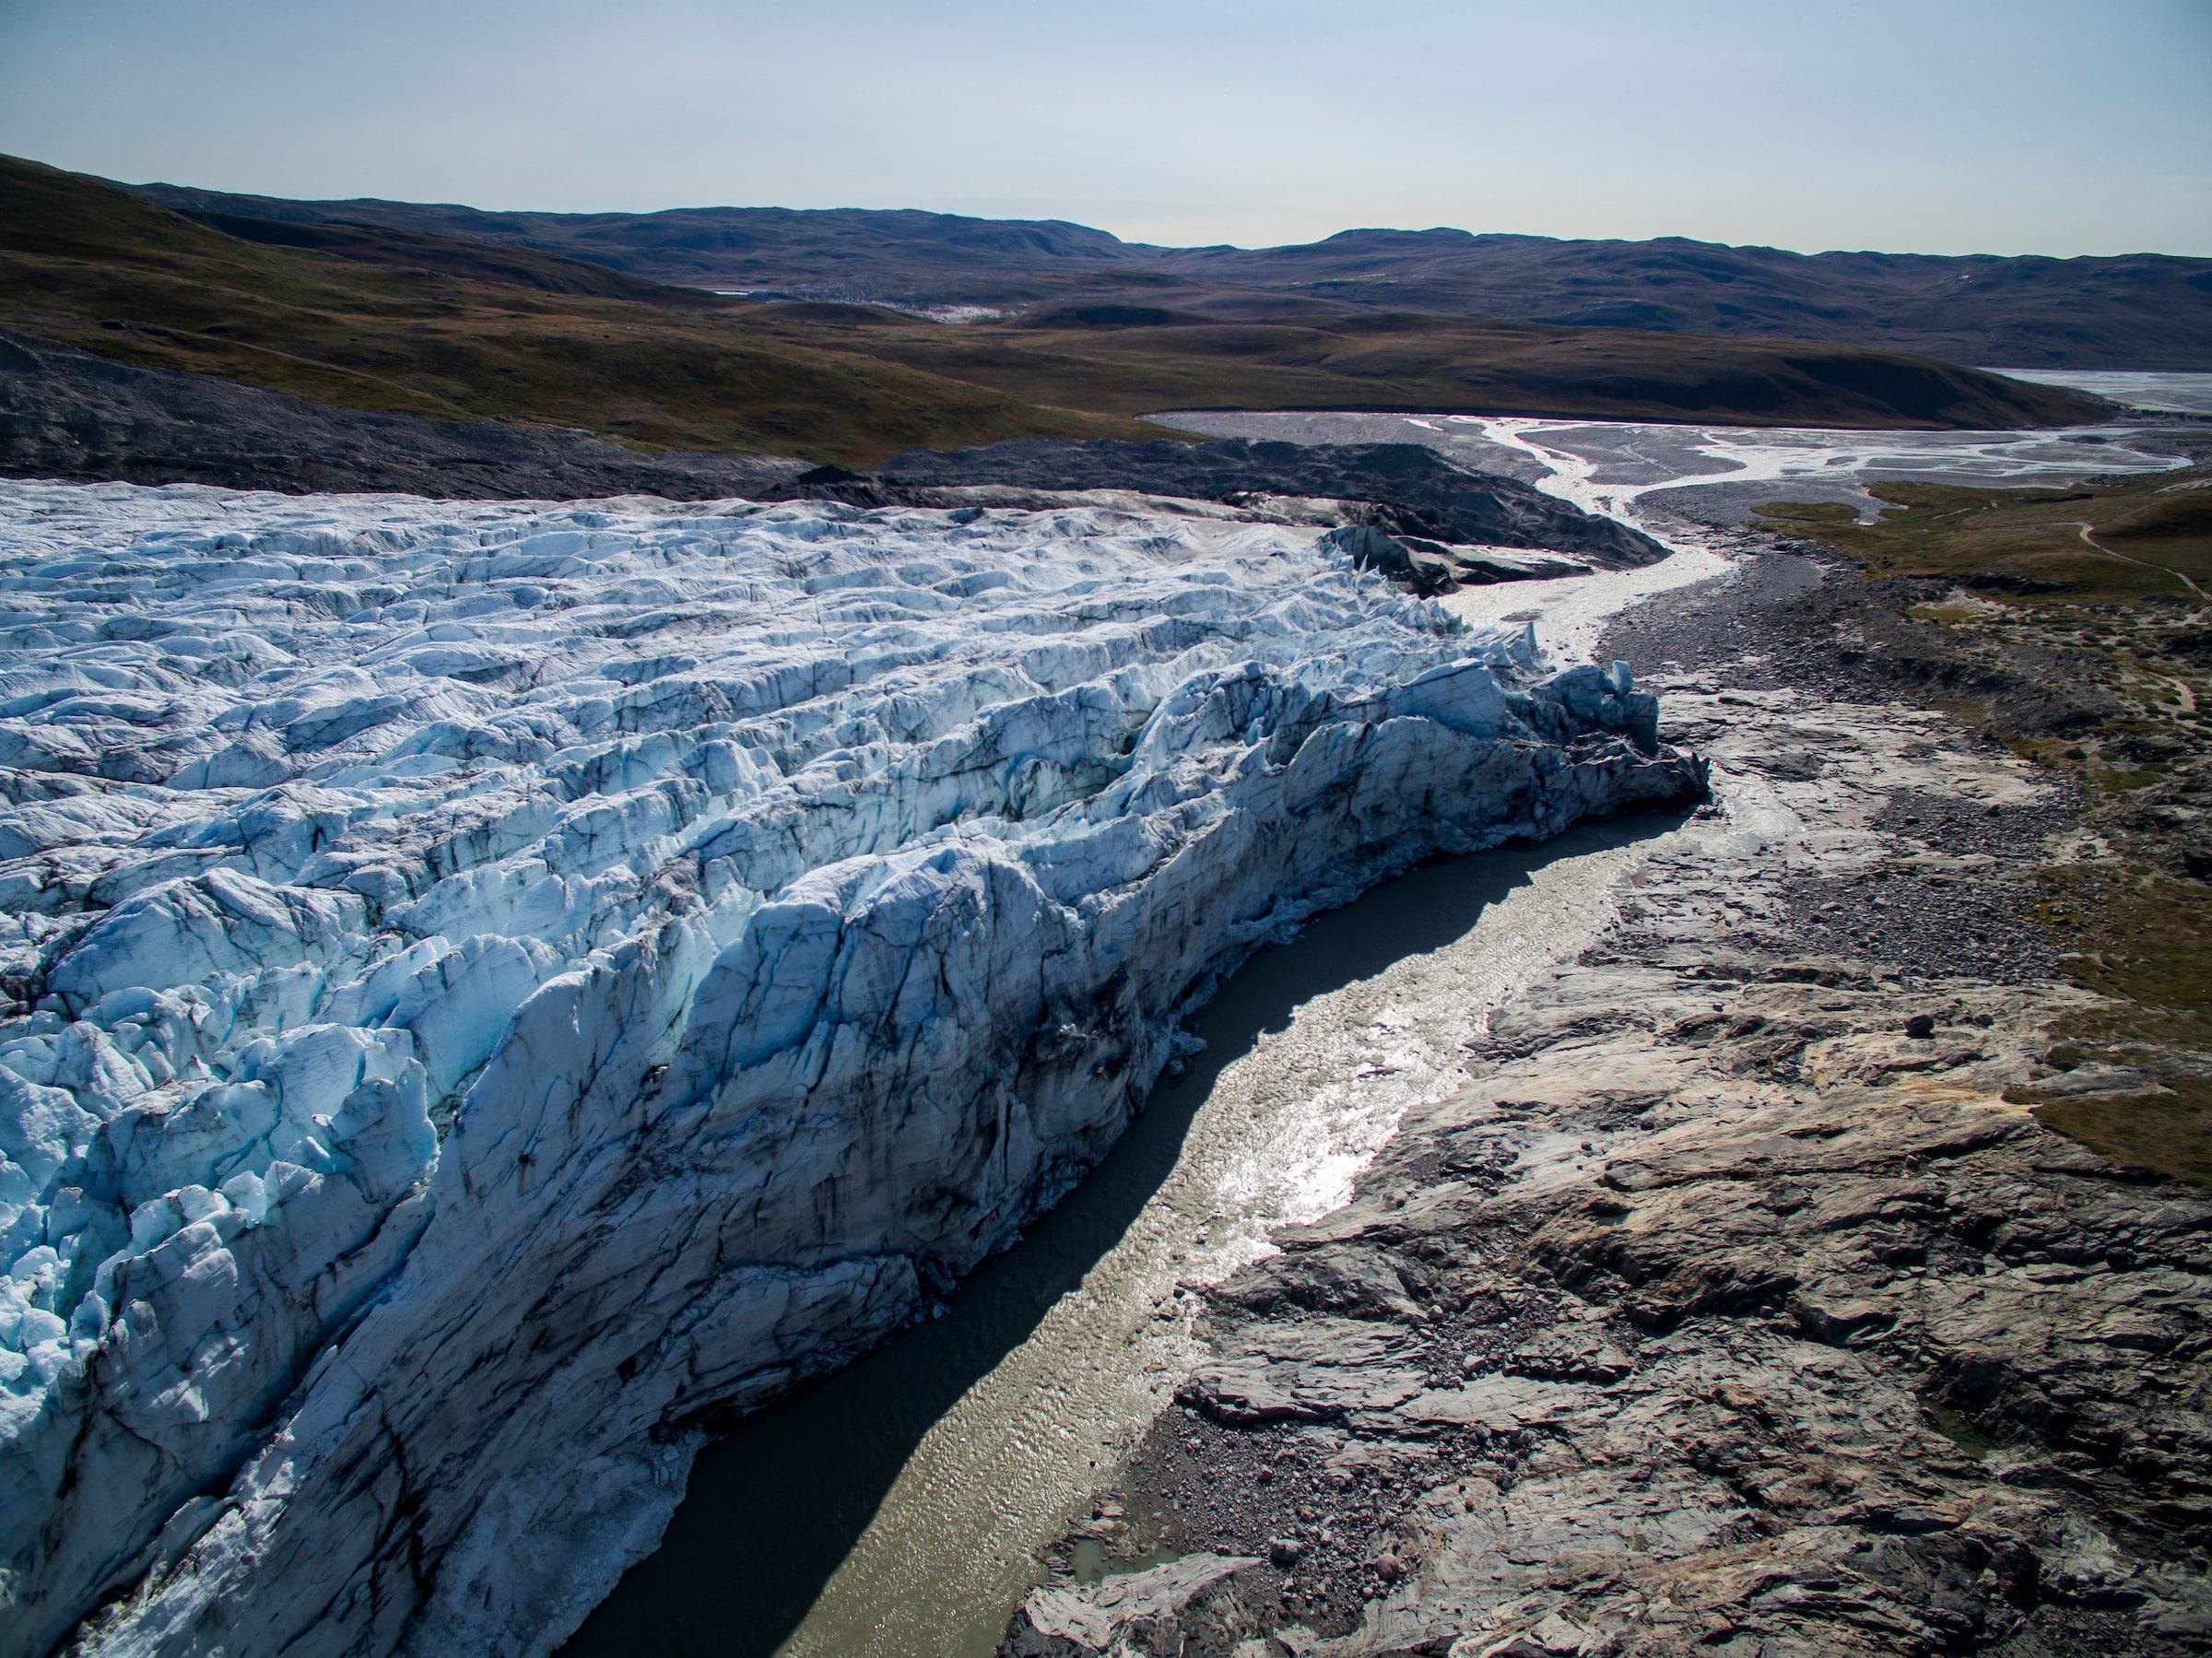 Russell glacier in Kangerlussuaq. Photo-Aningaaq R Carlsen - Visit Greenland